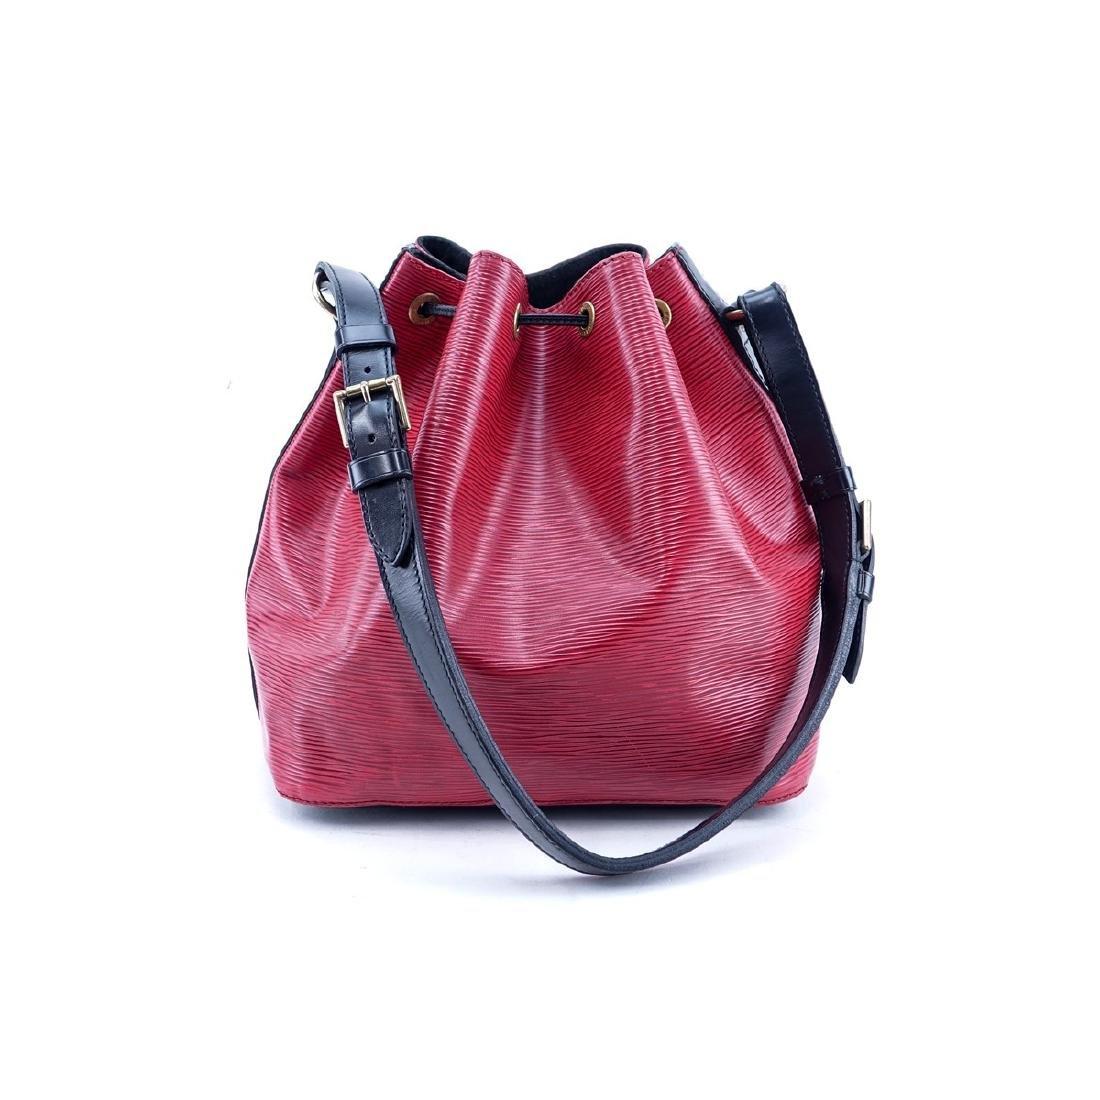 Louis Vuitton Red/Black Epi Leather Noe Bicolor - 2